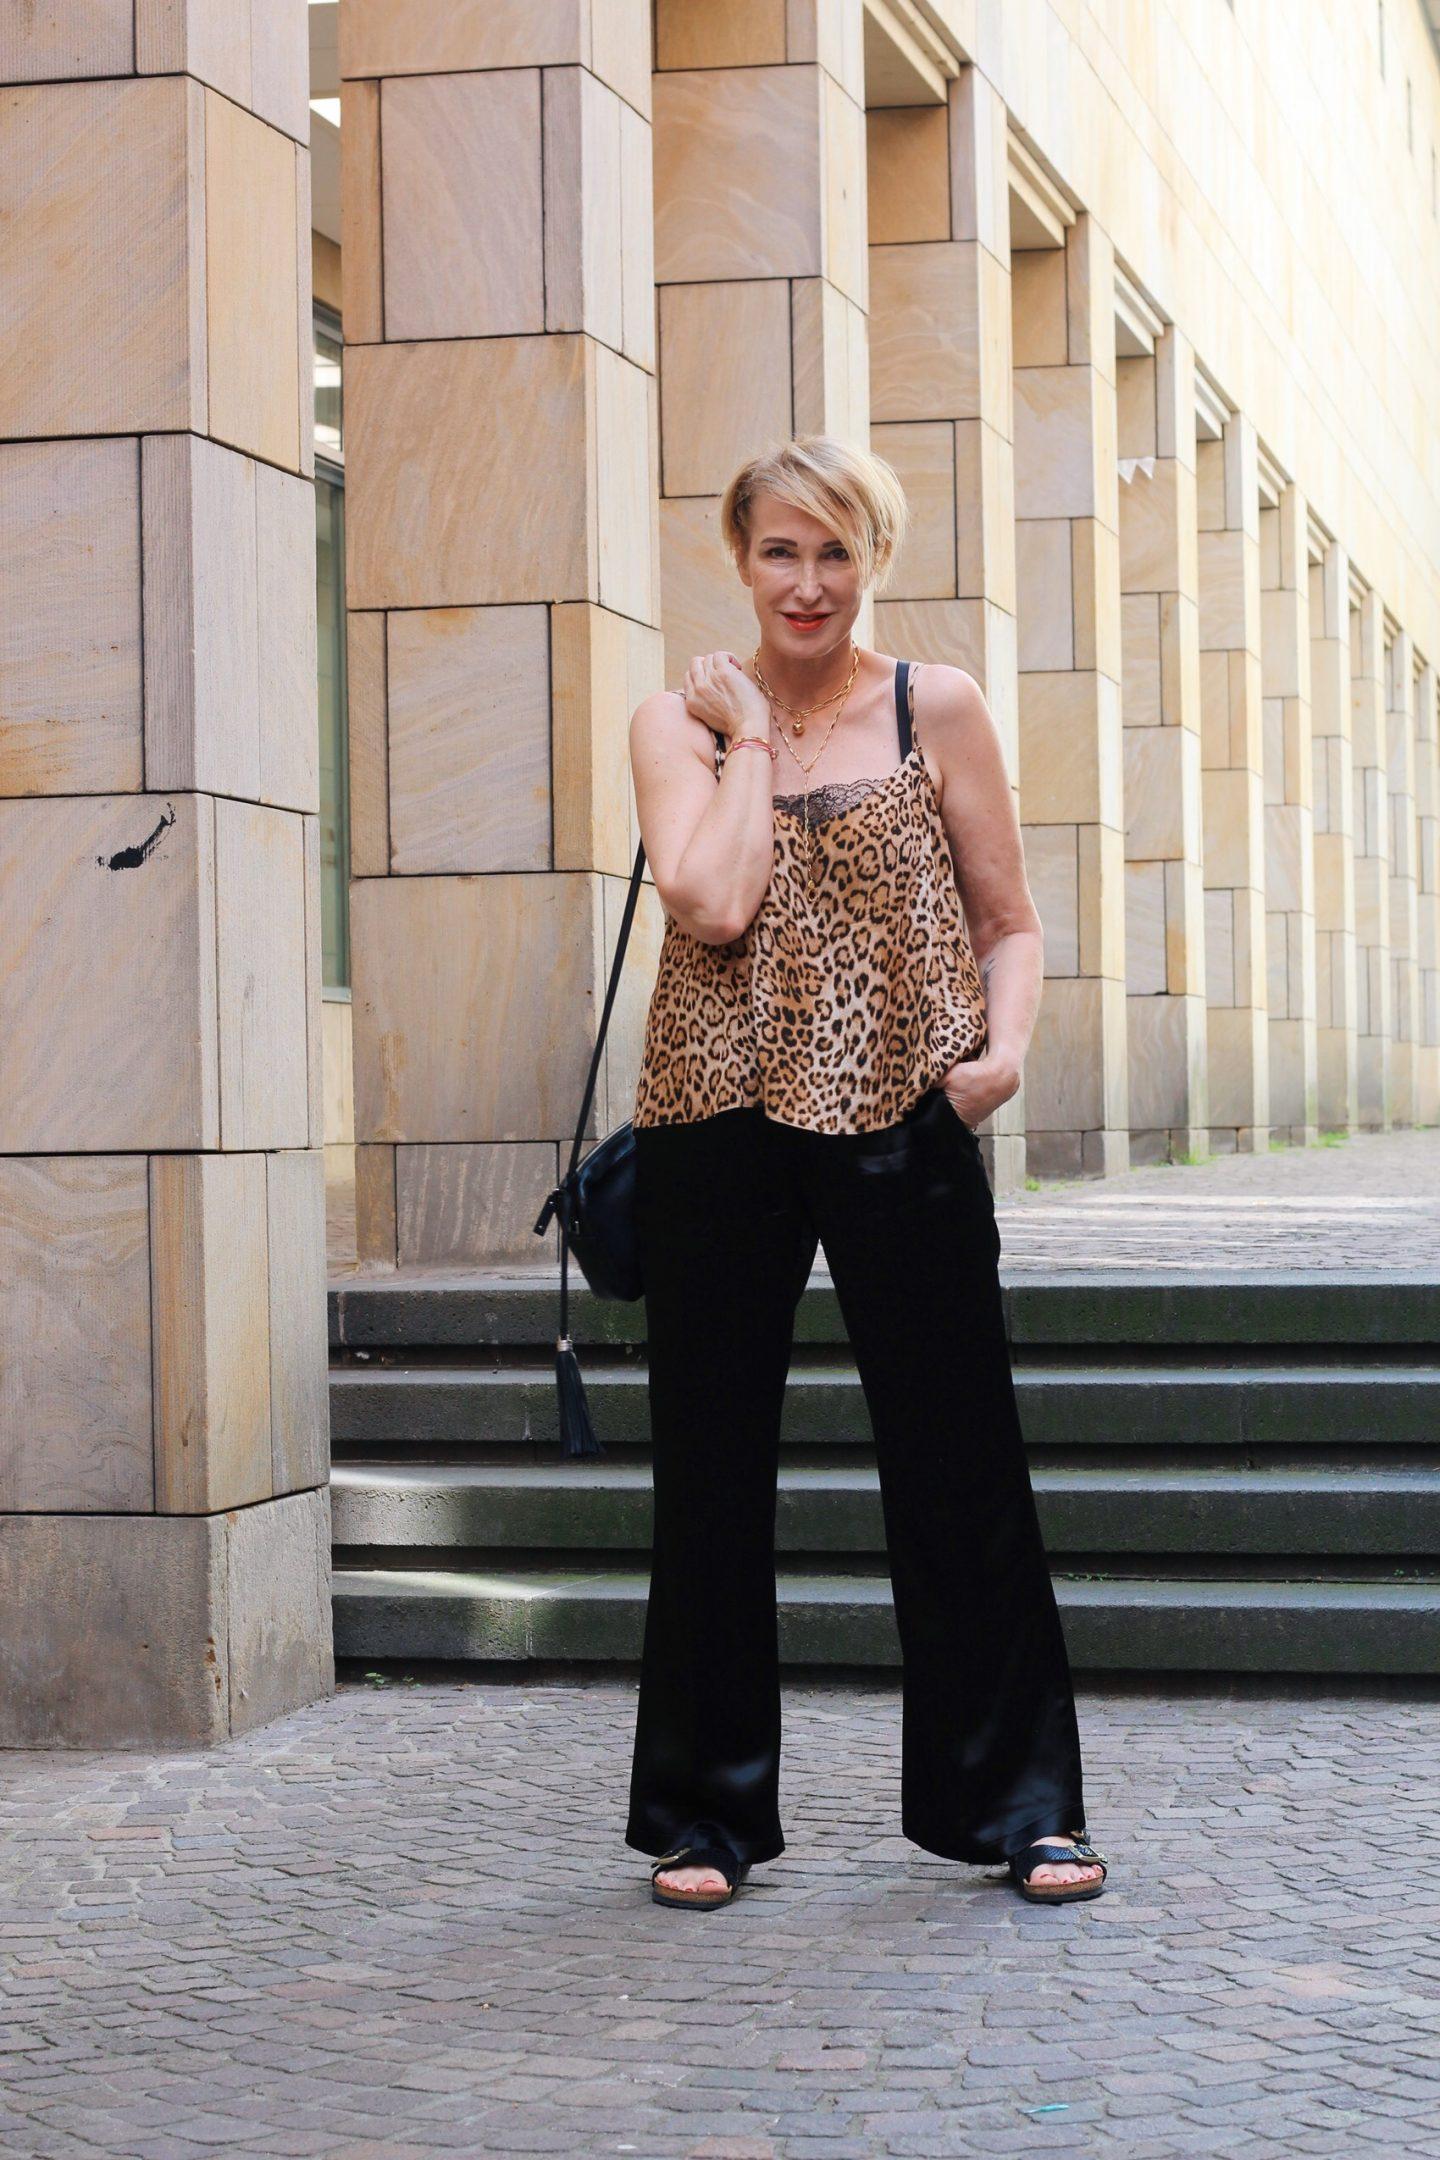 glamupyourlifestyle leo-print leopardenmuster ü-40-blog ü-50-blog ue-40-mode ue-50-mode